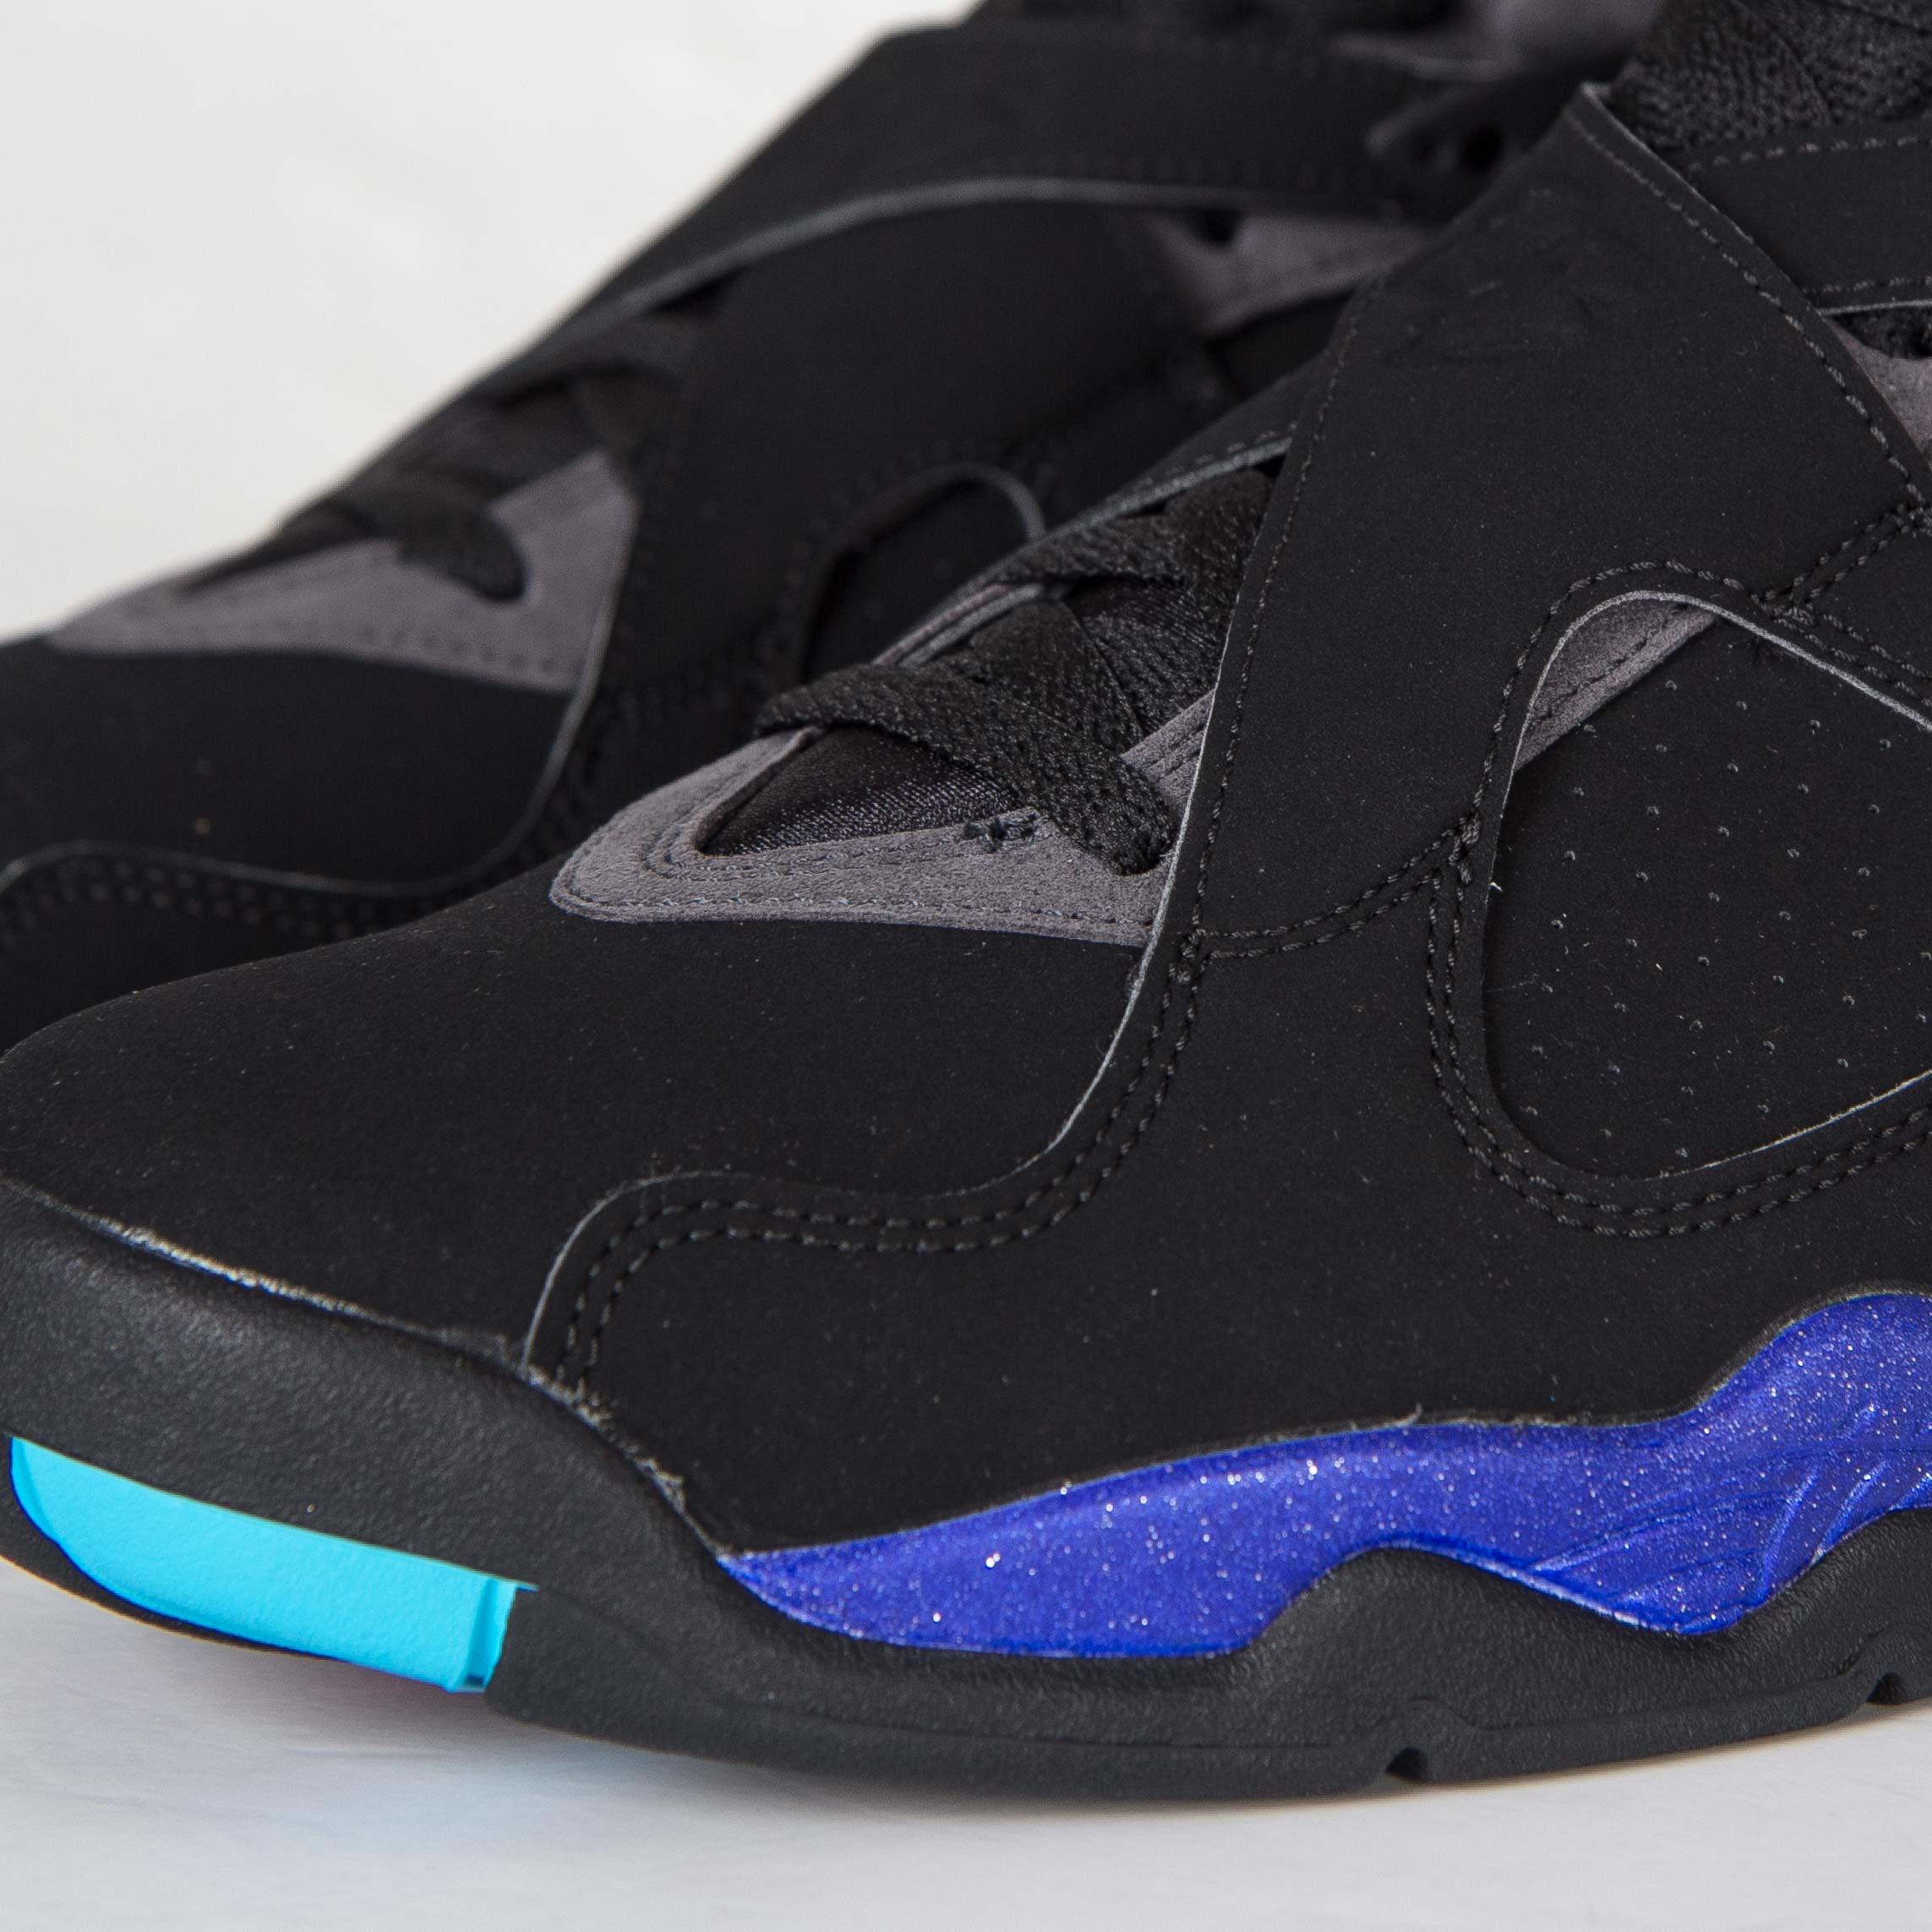 e99061a18545f6 Jordan Brand Air Jordan 8 Retro - 305381-025 - Sneakersnstuff ...